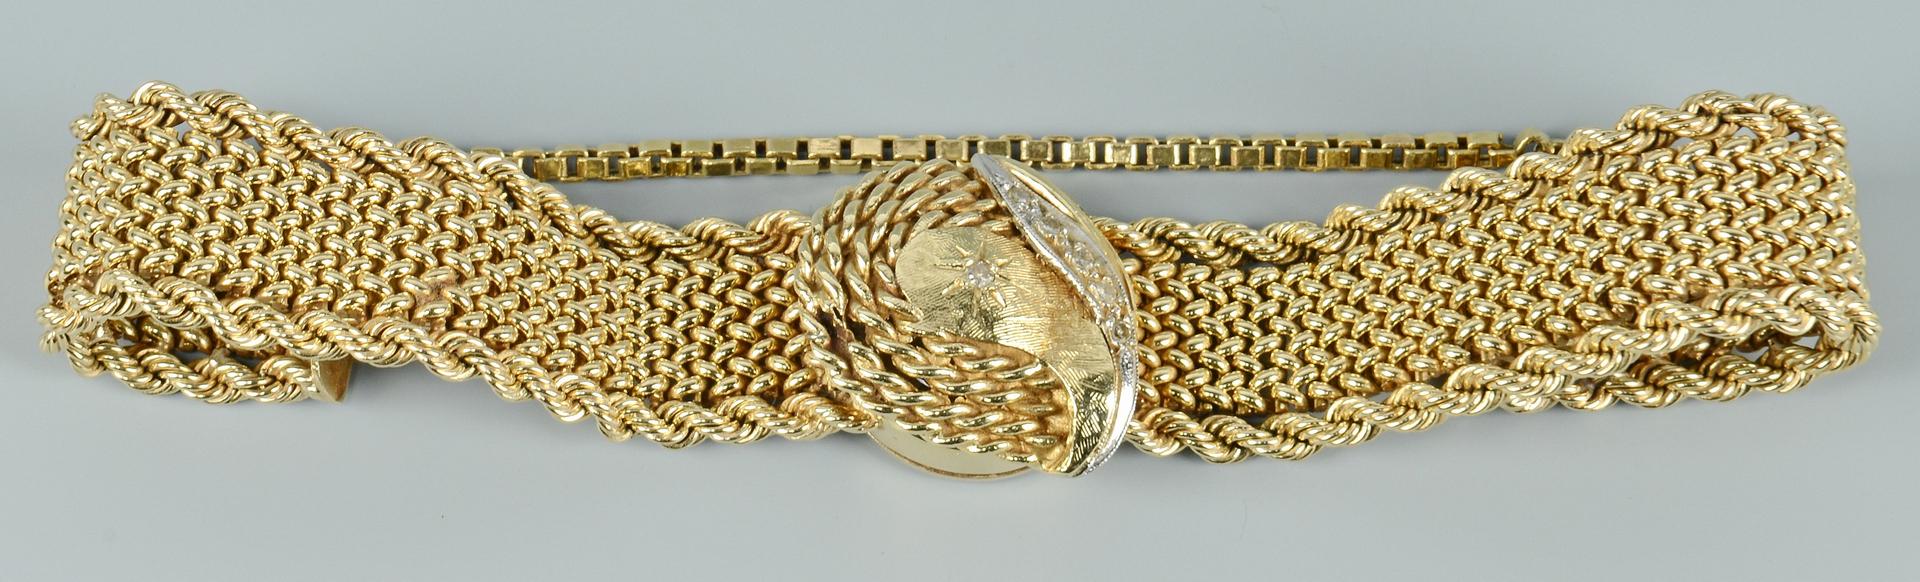 Lot 3088068: 14k Lady's Luva Bracelet Watch w/ Covered Dial